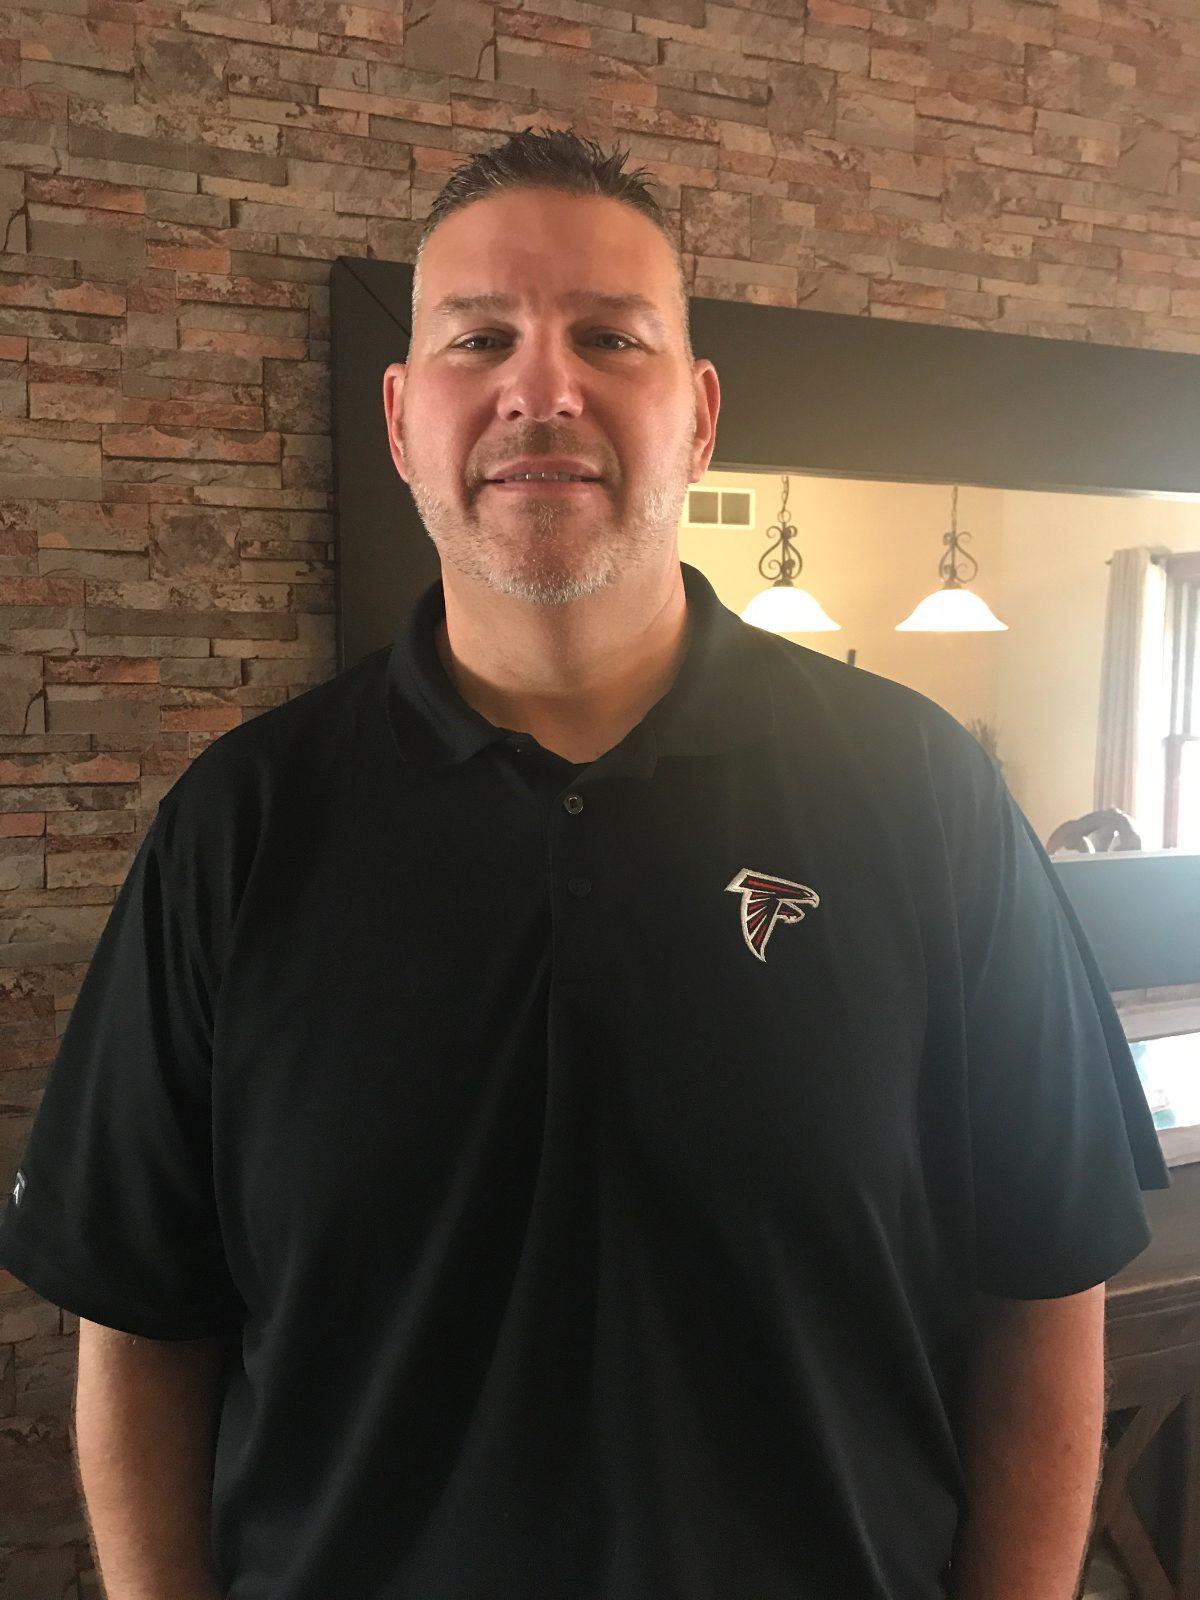 Ted Hayden Announced as Lady Falcons Basketball Head Coach